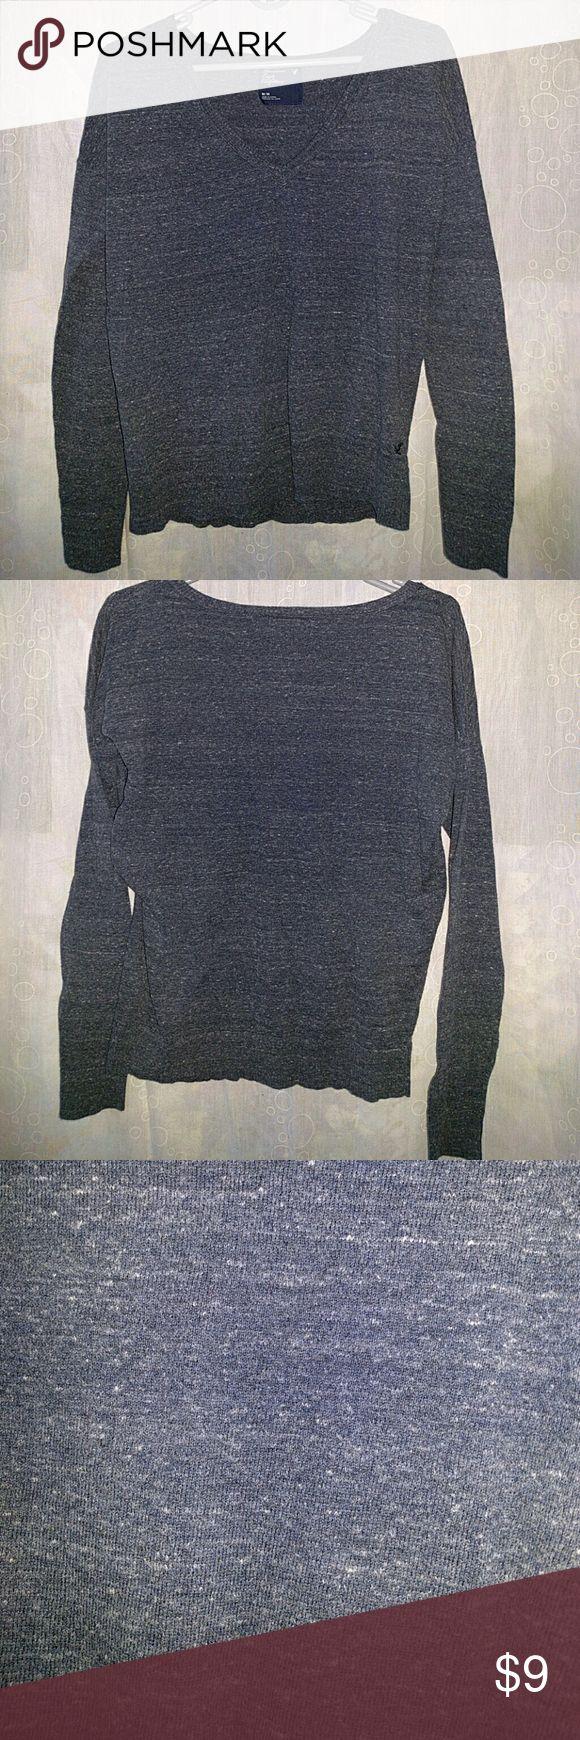 American Eagle Outfitters V-neck Sweater Blue-grey AE v-neck sweater. American Eagle Outfitters Sweaters V-Necks